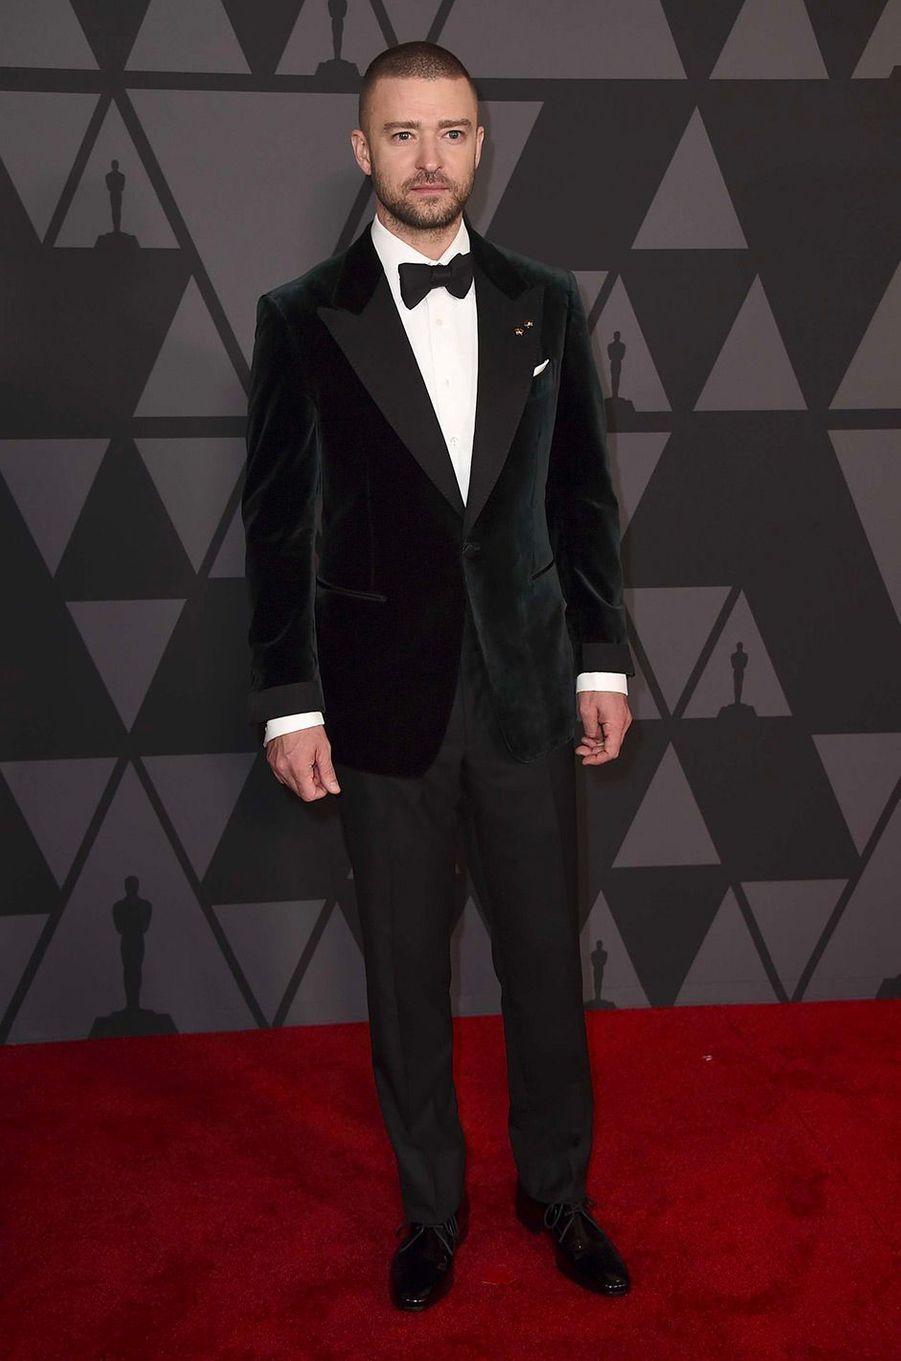 Justin Timberlake aux Governors Awards à Los Angeles, samedi 11 novembre